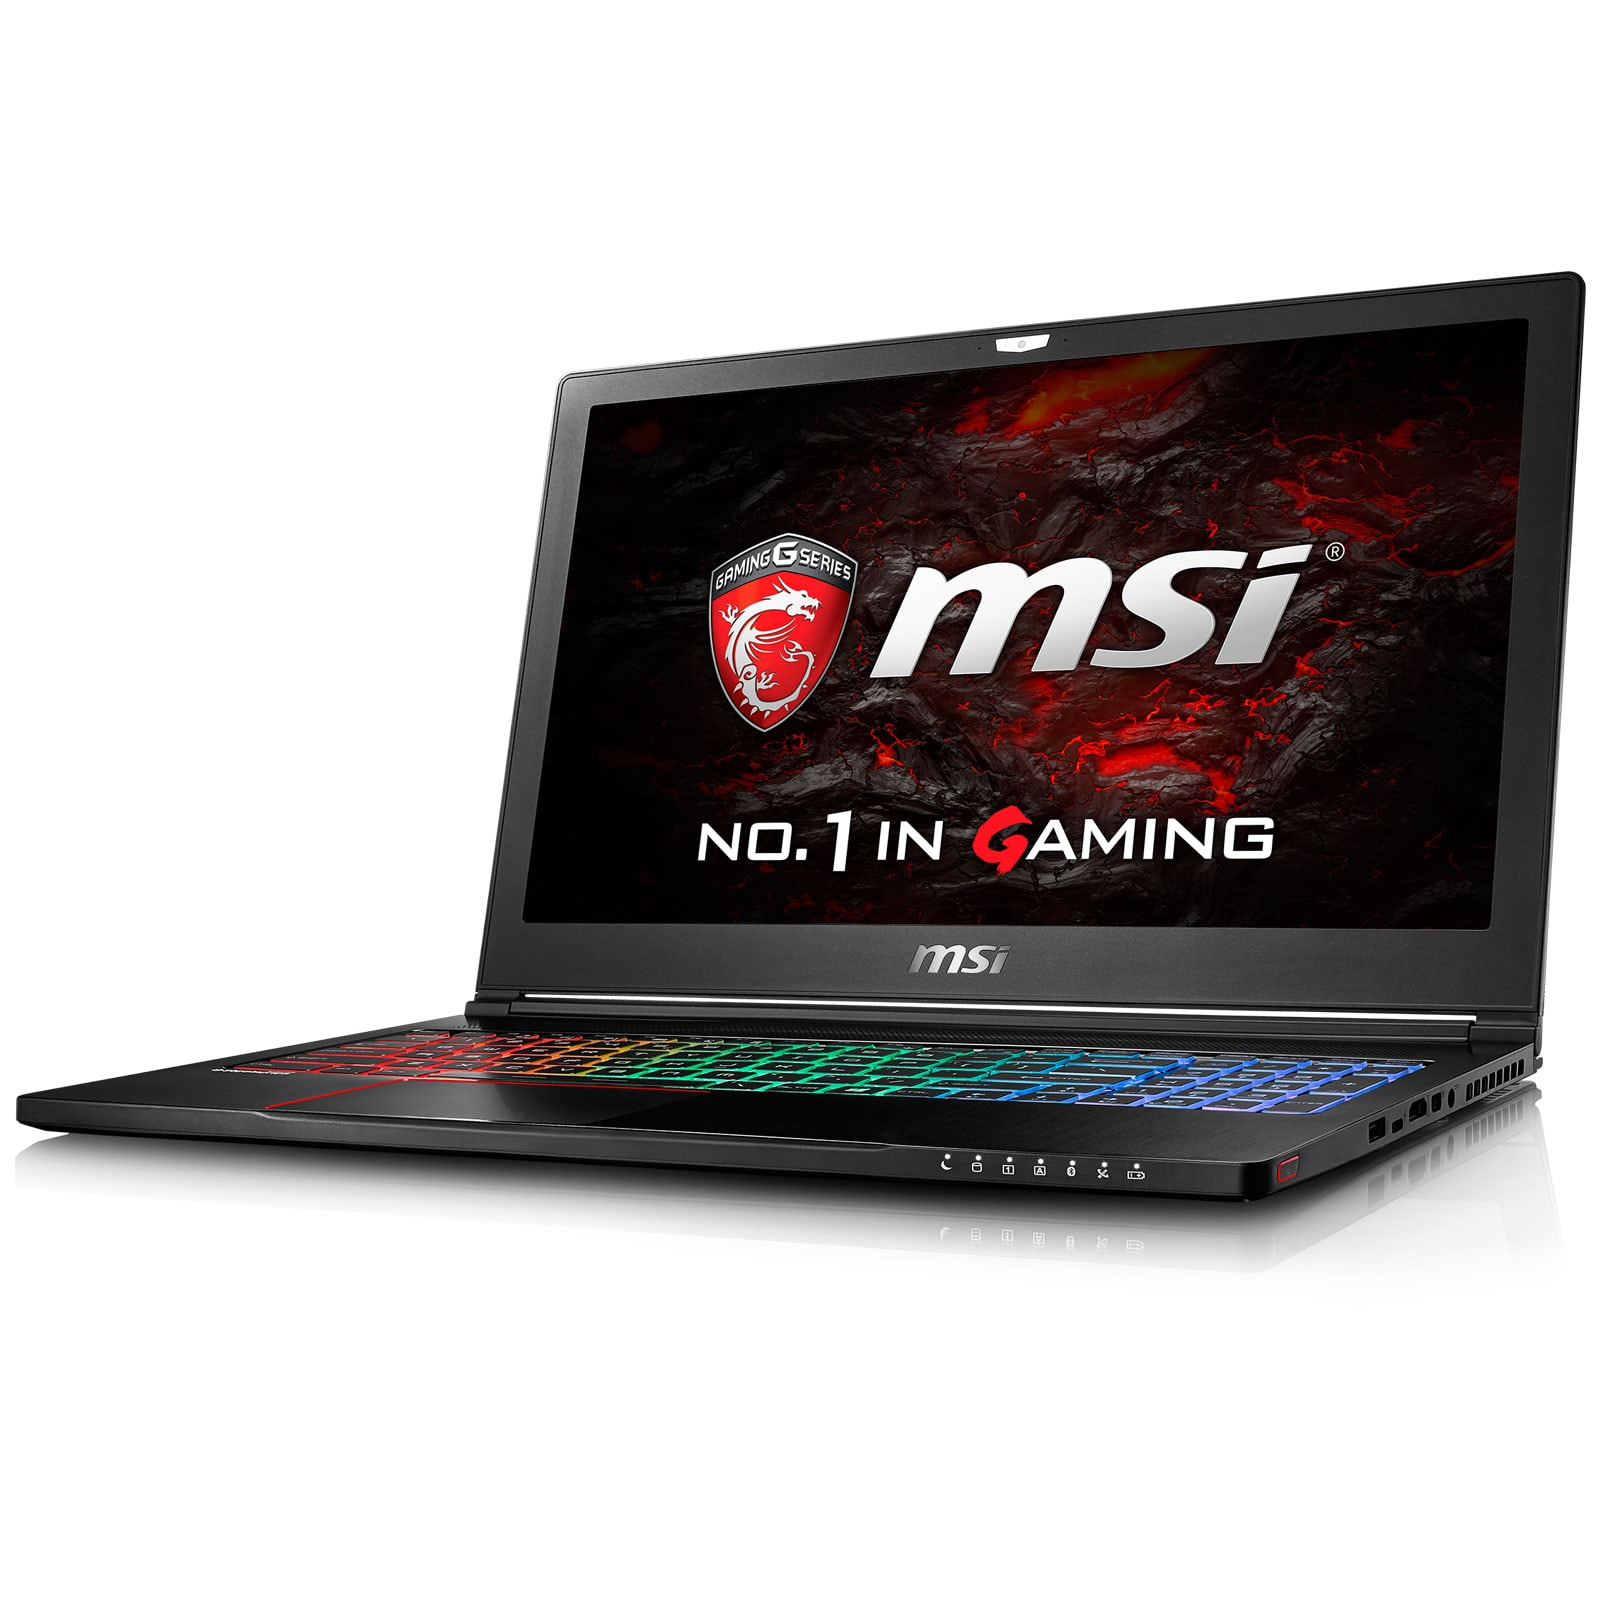 MSI GS63VR 7RG-009FR - PC portable MSI - Cybertek.fr - 4